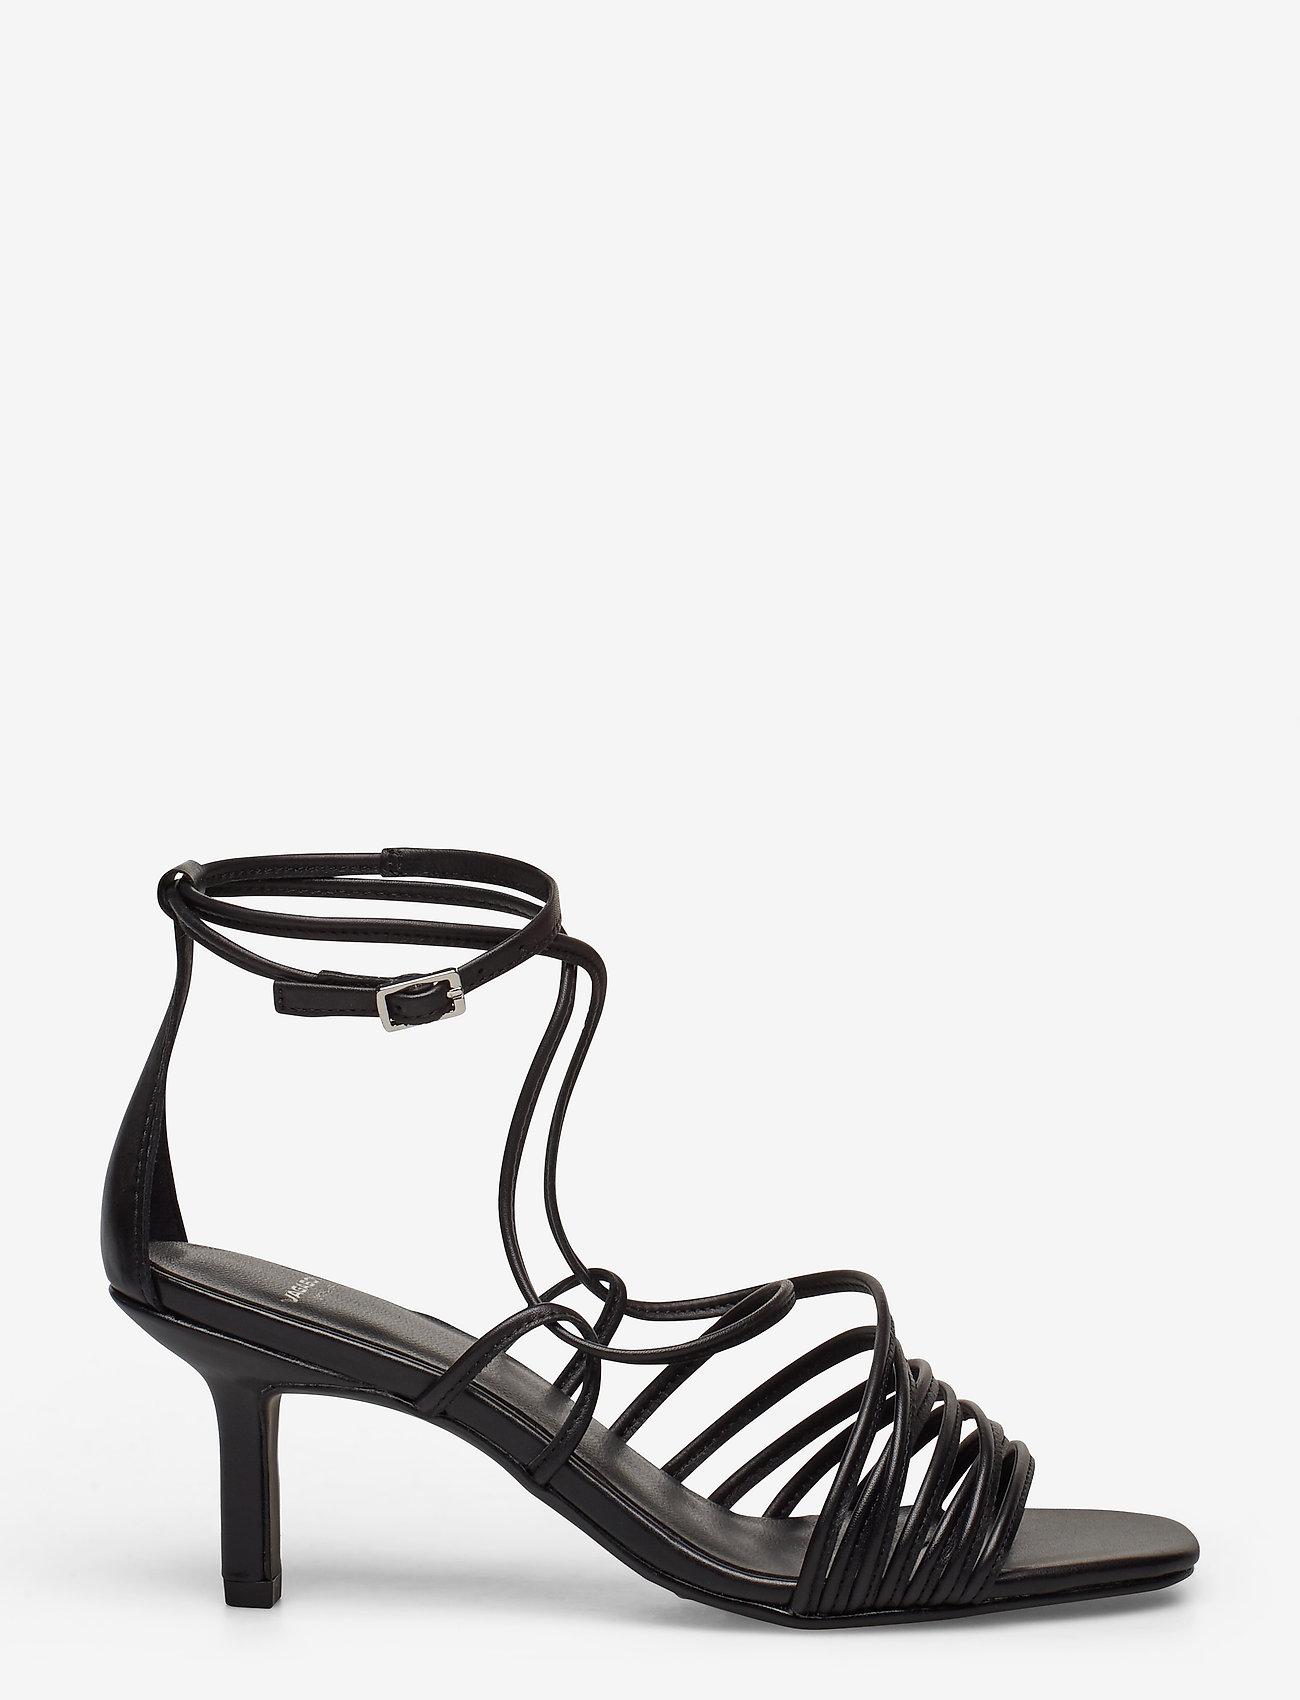 VAGABOND - AMANDA - sandały na obcasie - black - 1